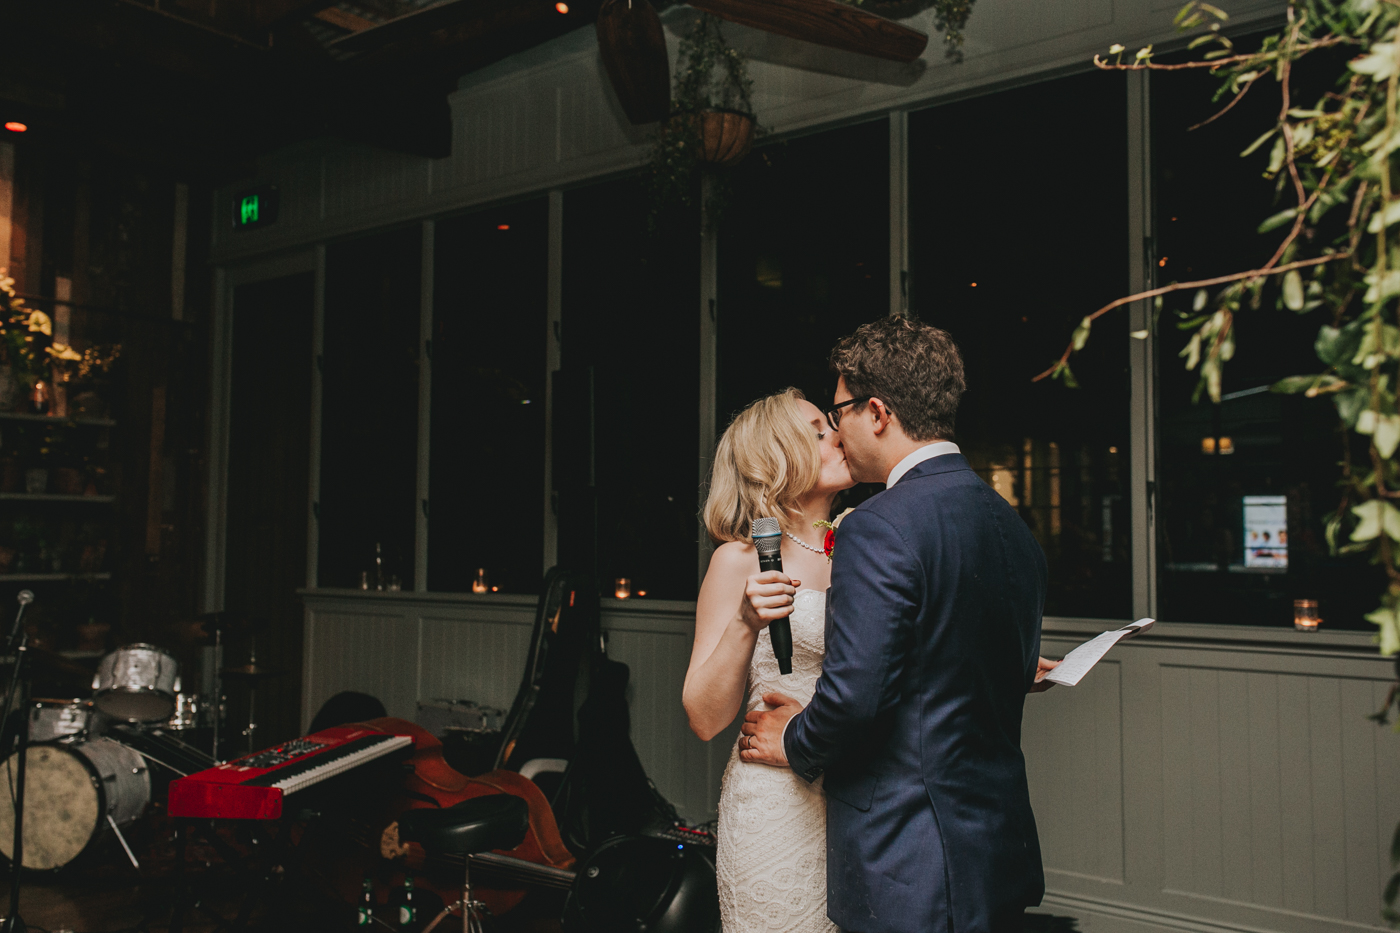 Jo & Tom Wedding - The Grounds of Alexandria - Samantha Heather Photography-353.jpg